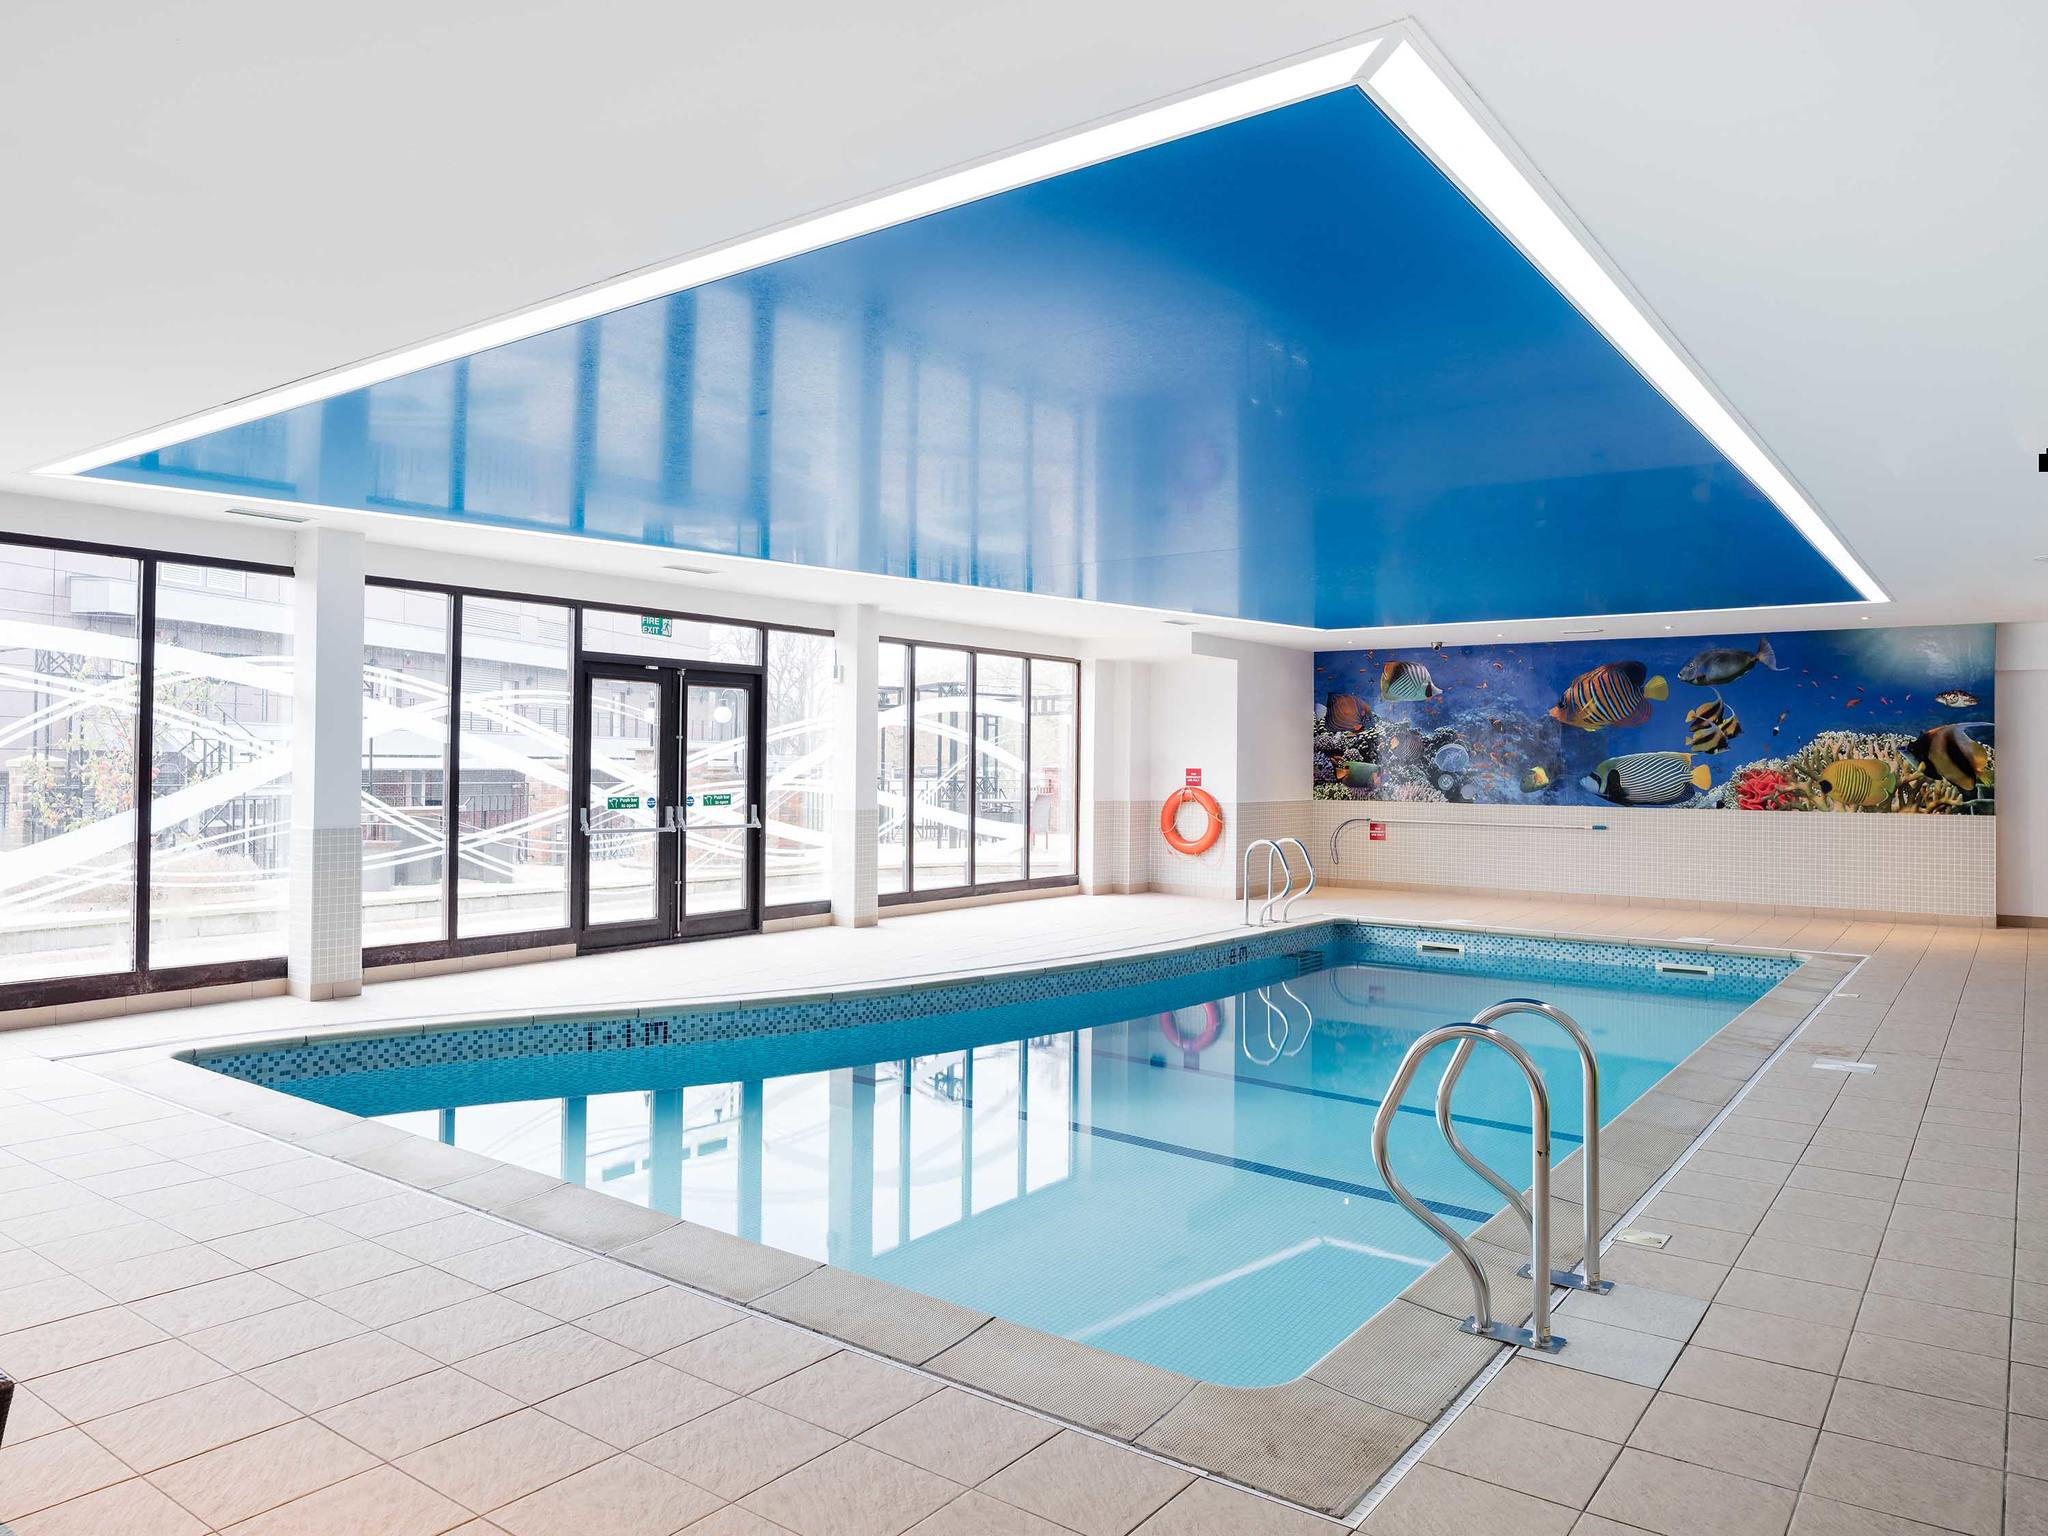 Novotel York Centre | Relaxing & Spacious Hotel in York